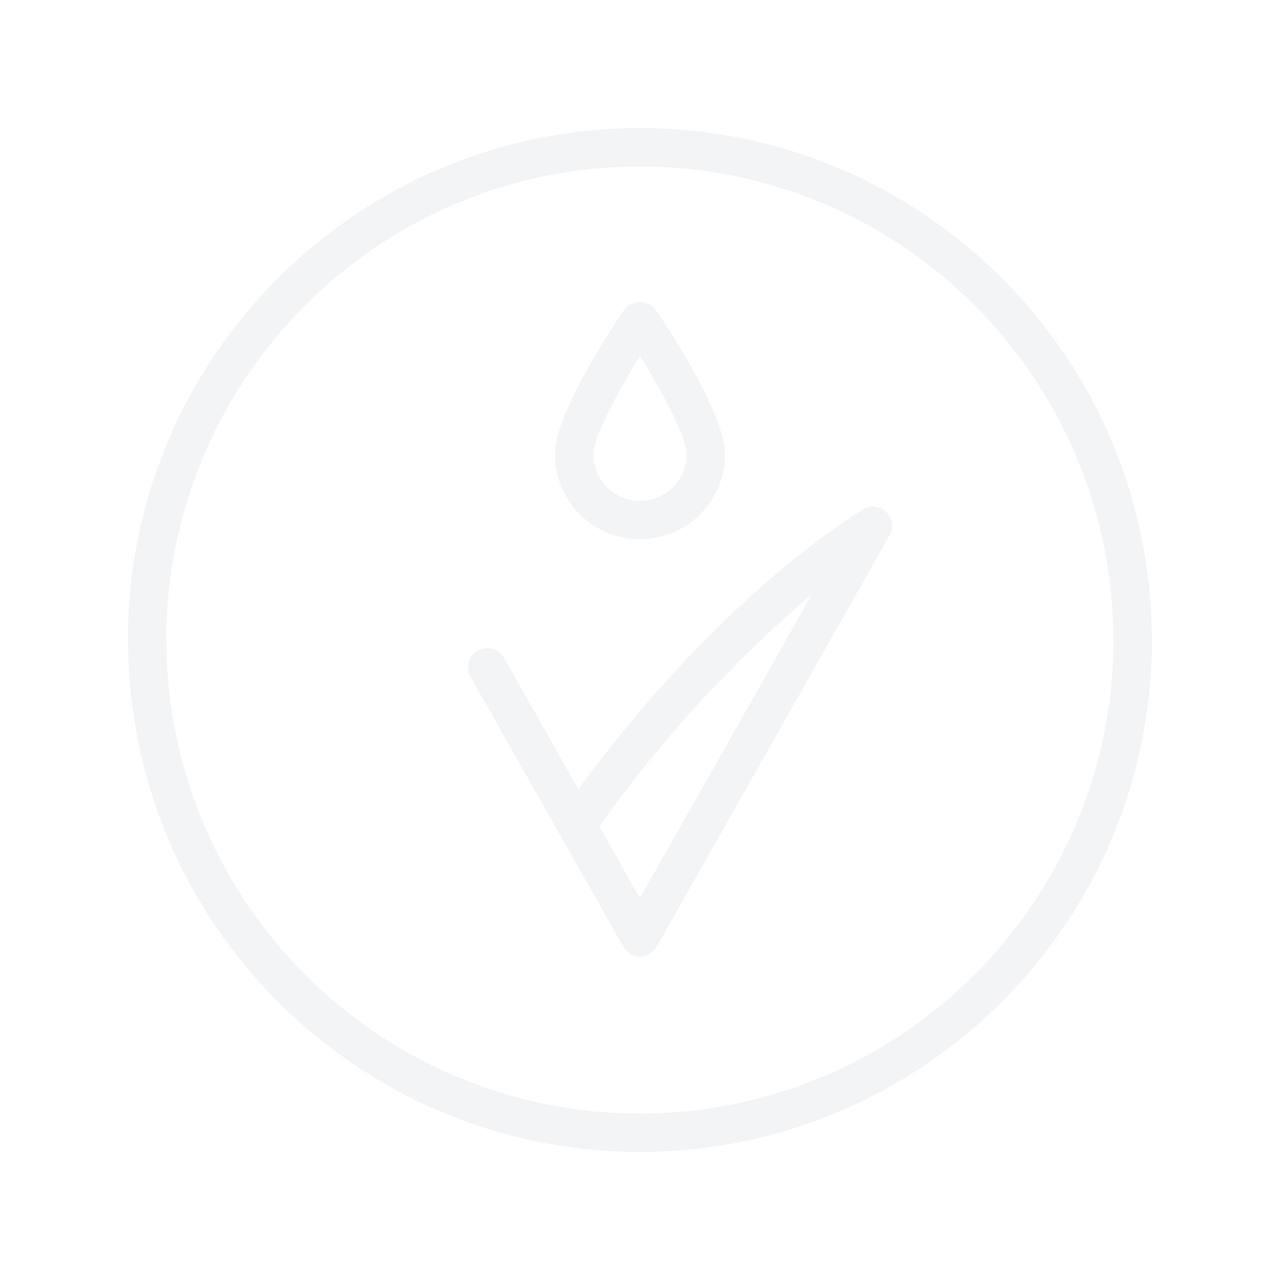 E.L.F. Beautifully Bare Blush Rose Royalty 10g